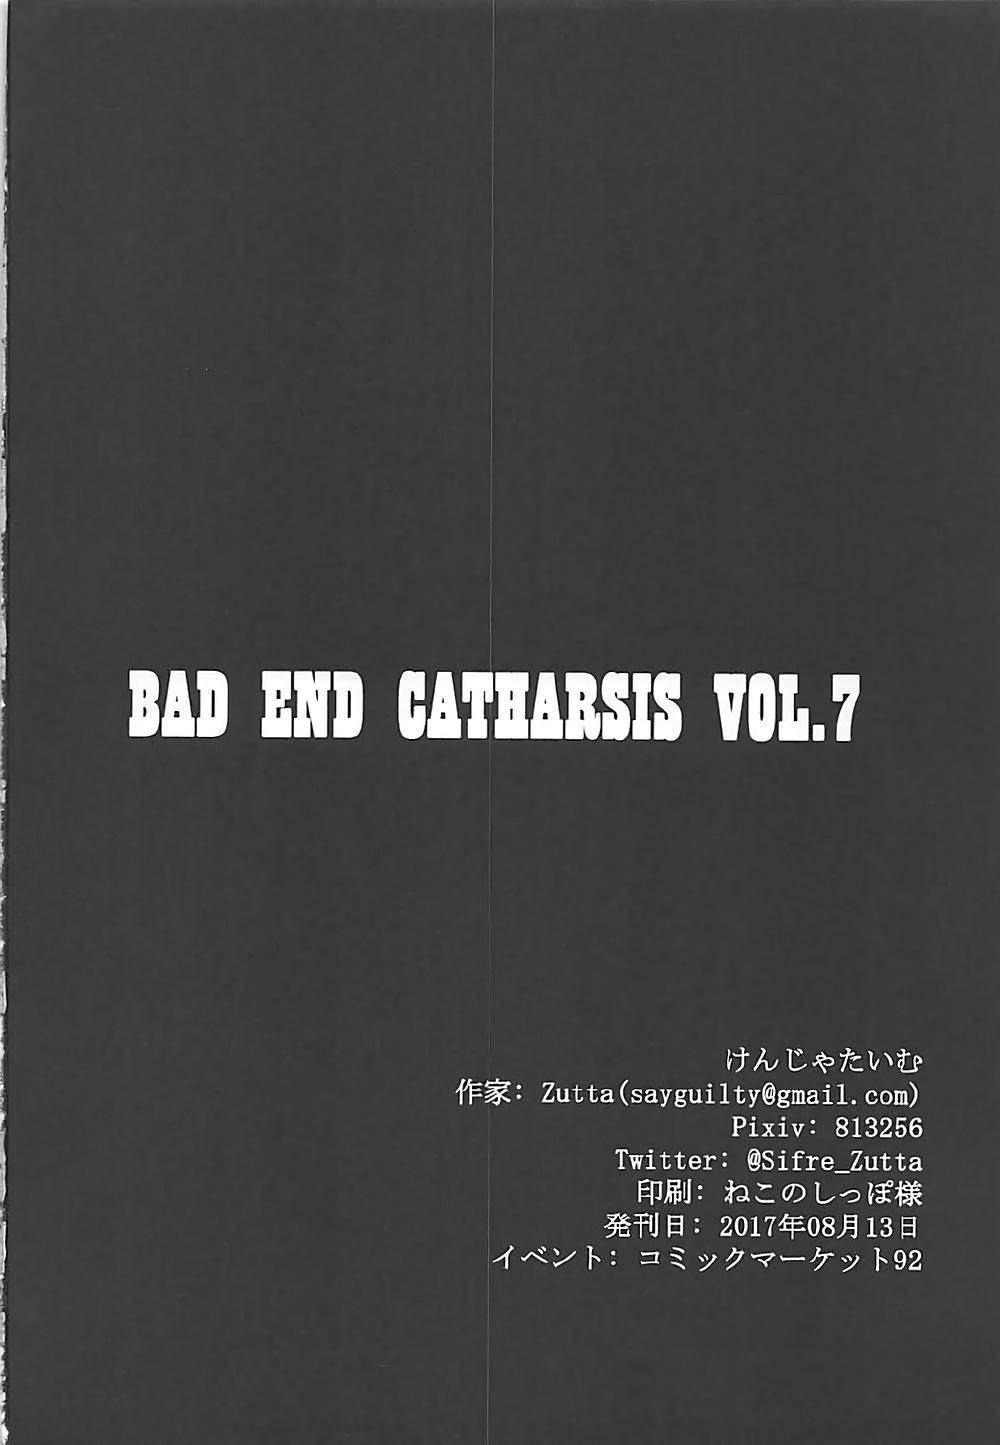 Bad End Catharsis Vol. 7 24